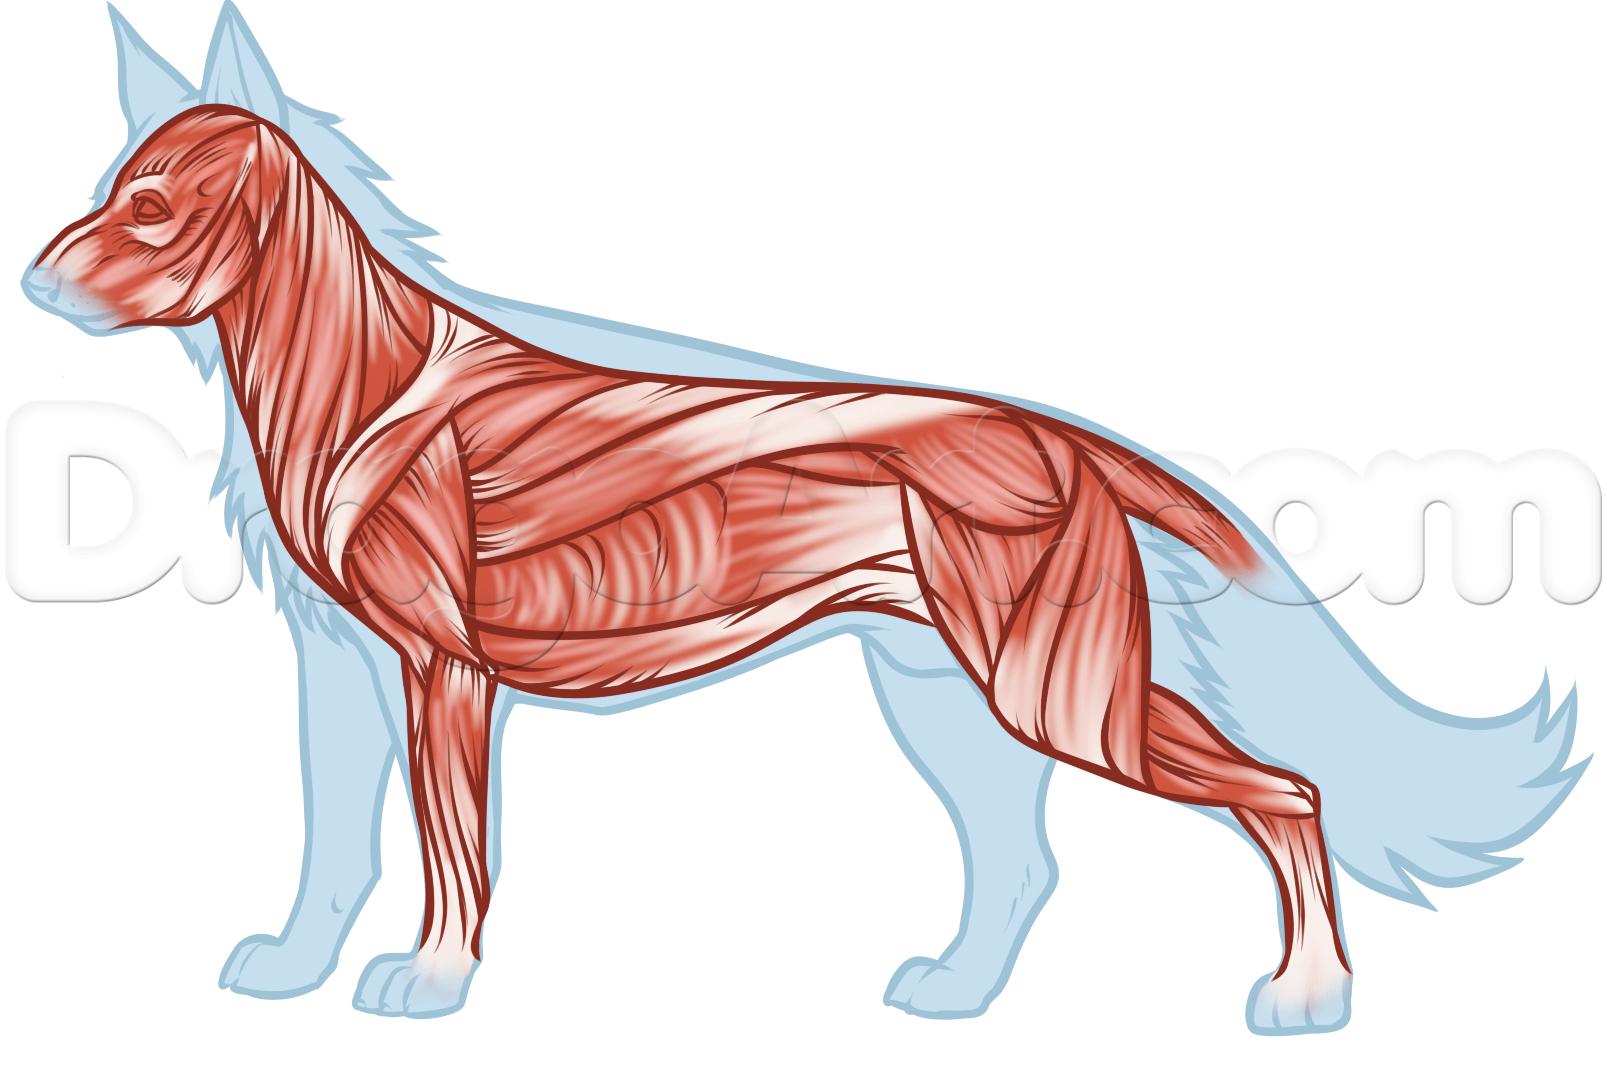 Ри��ем живо�н�� ана�омия волка